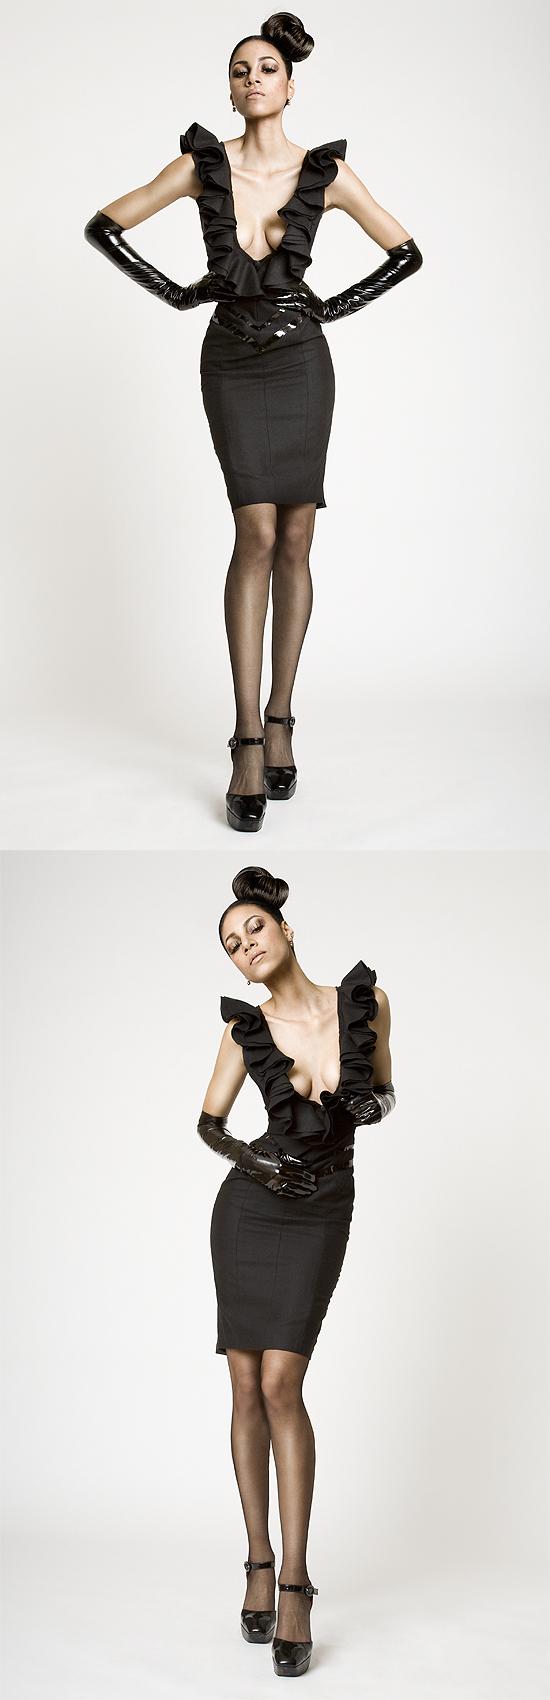 NYC Apr 03, 2009 Megyn Barroner model:  Natalie, Makeup: Kenecia Lashae